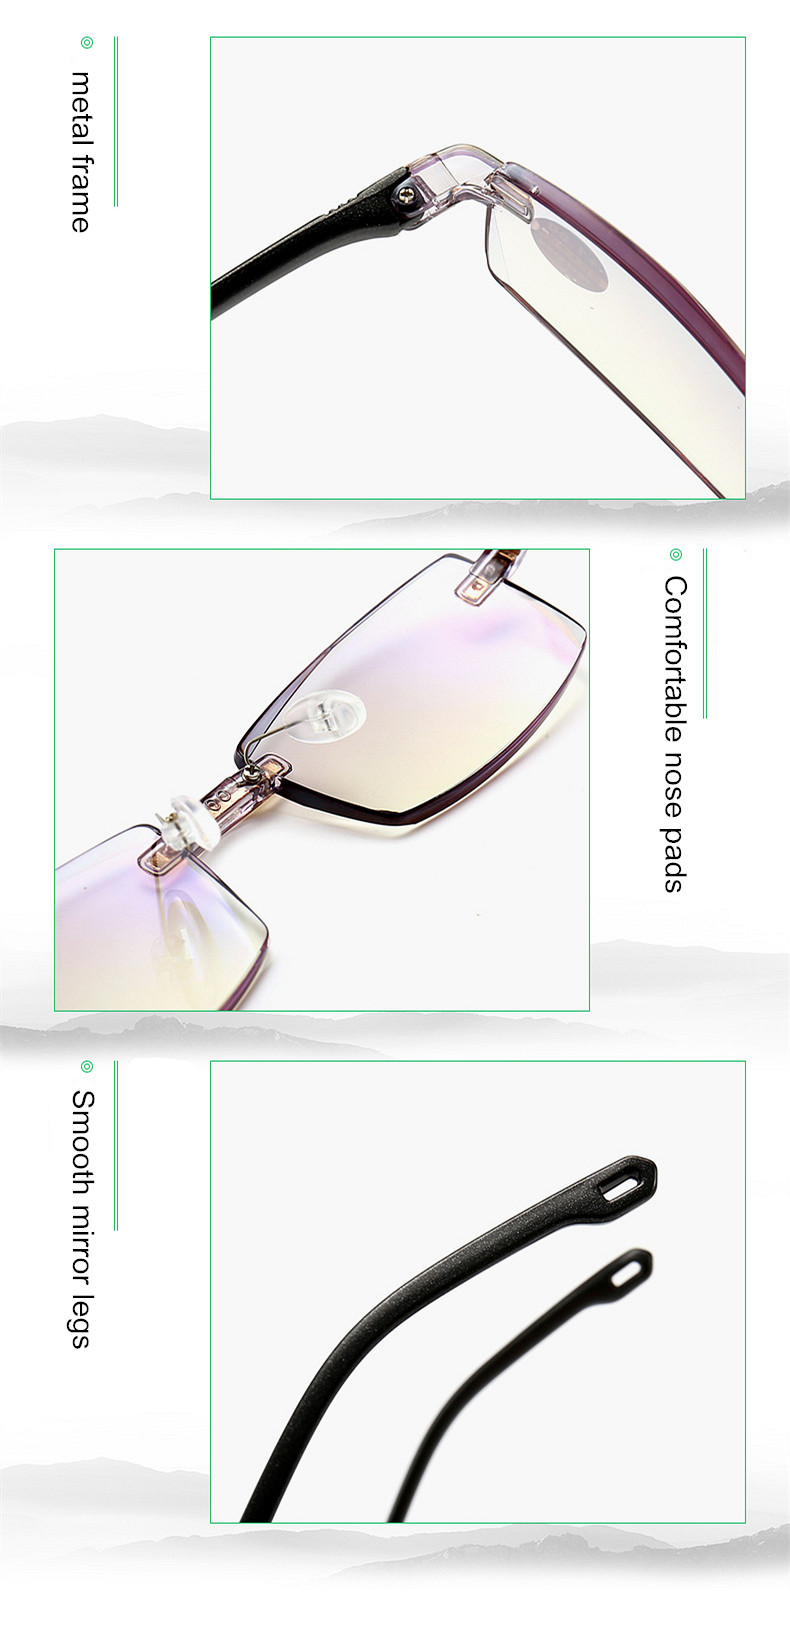 XojoX Anti Luz Azul Mulheres Óculos de Leitura Sem Aro Óculos Moda ... c2ea2441f3